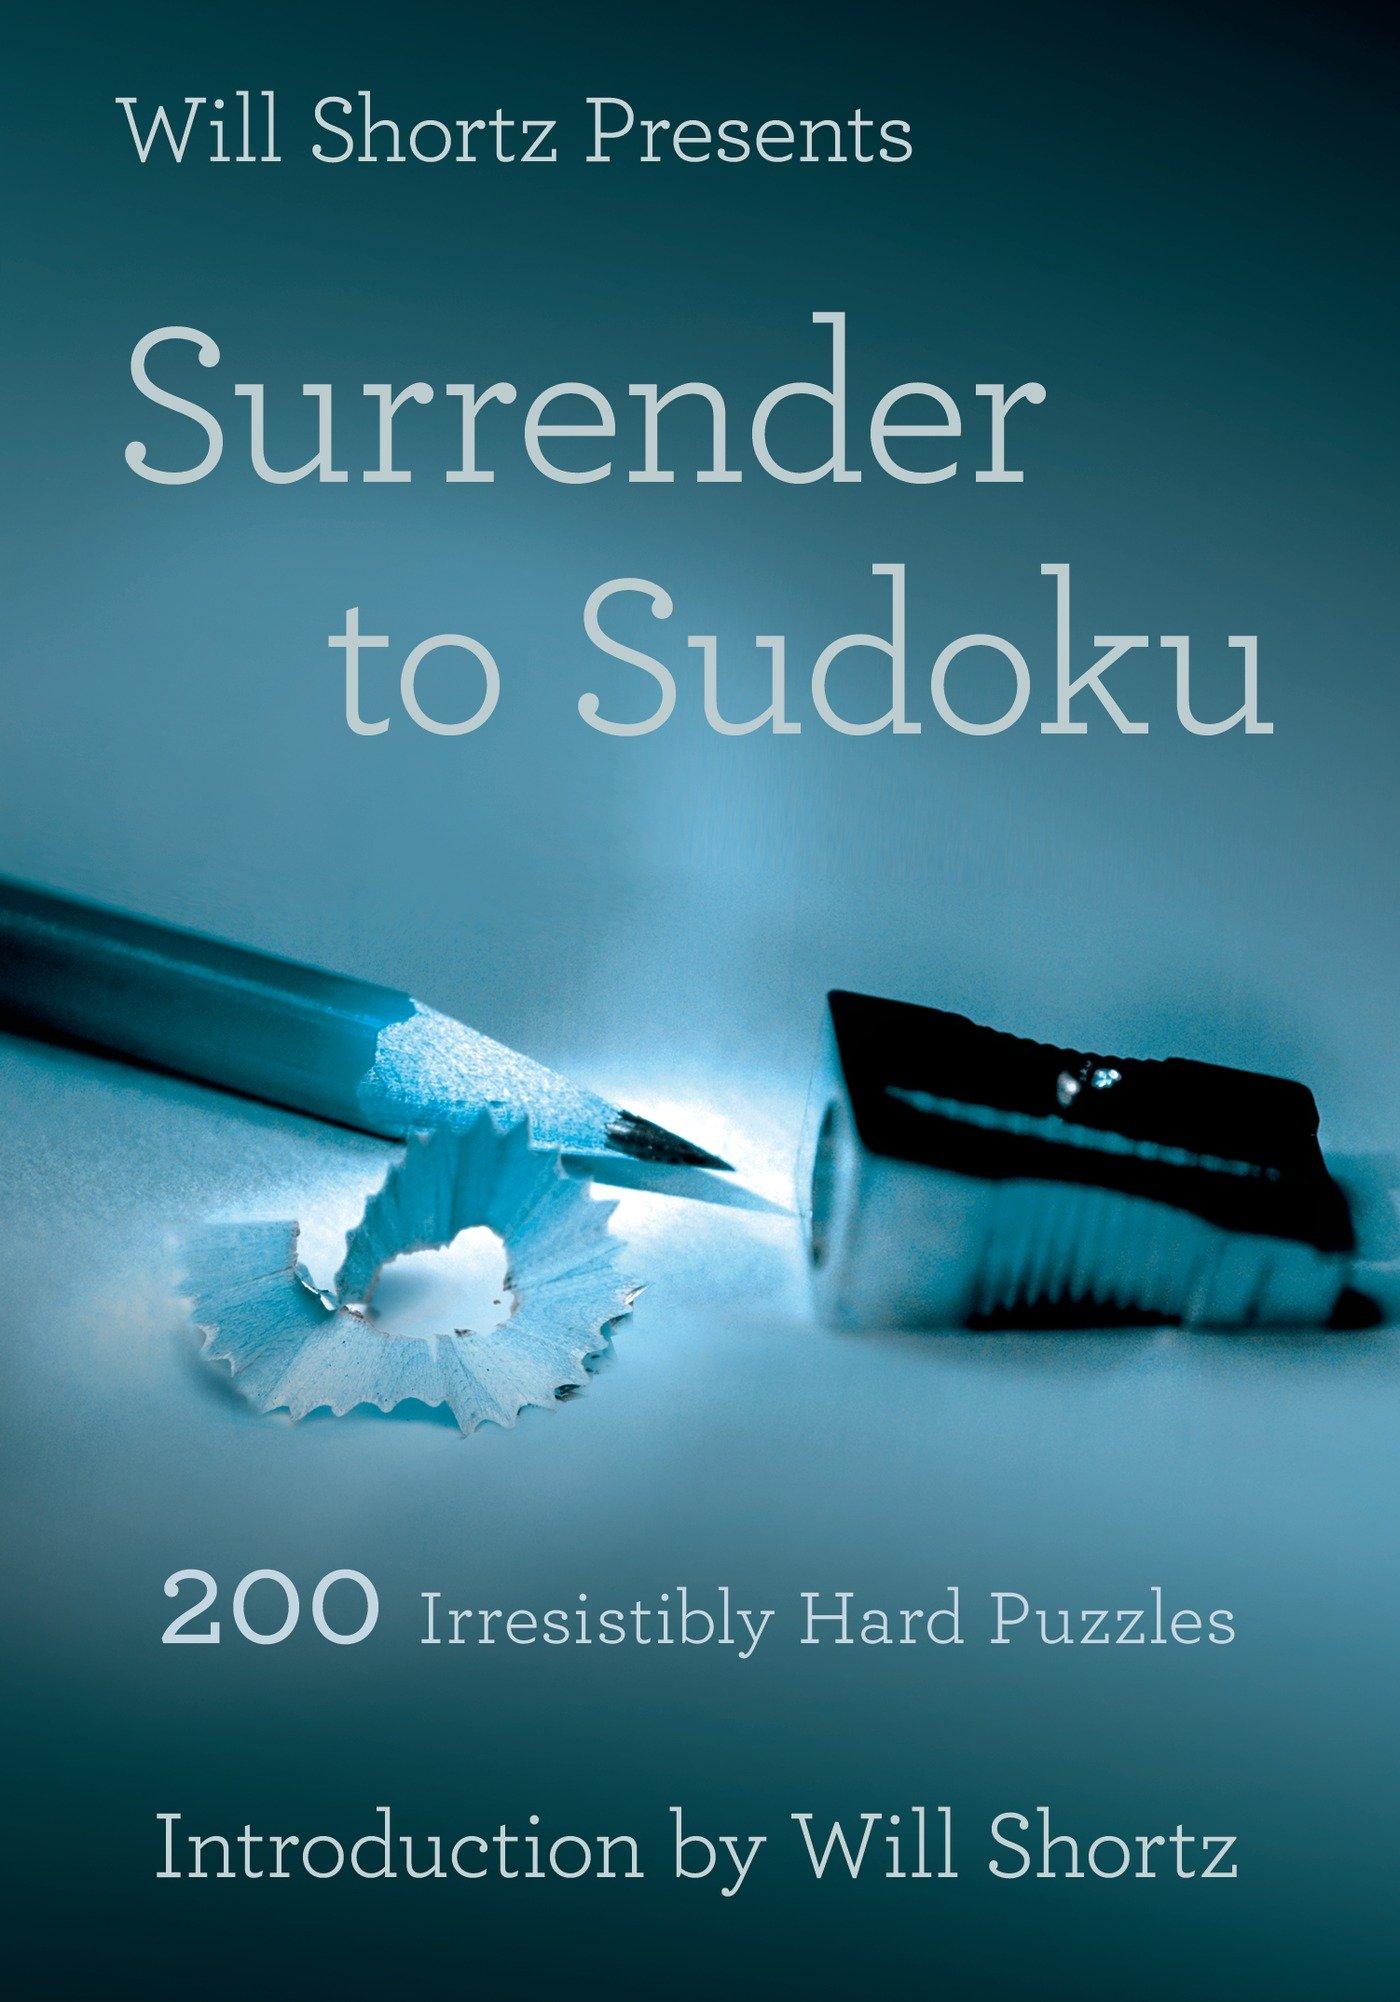 Will Shortz Presents Surrender Sudoku product image